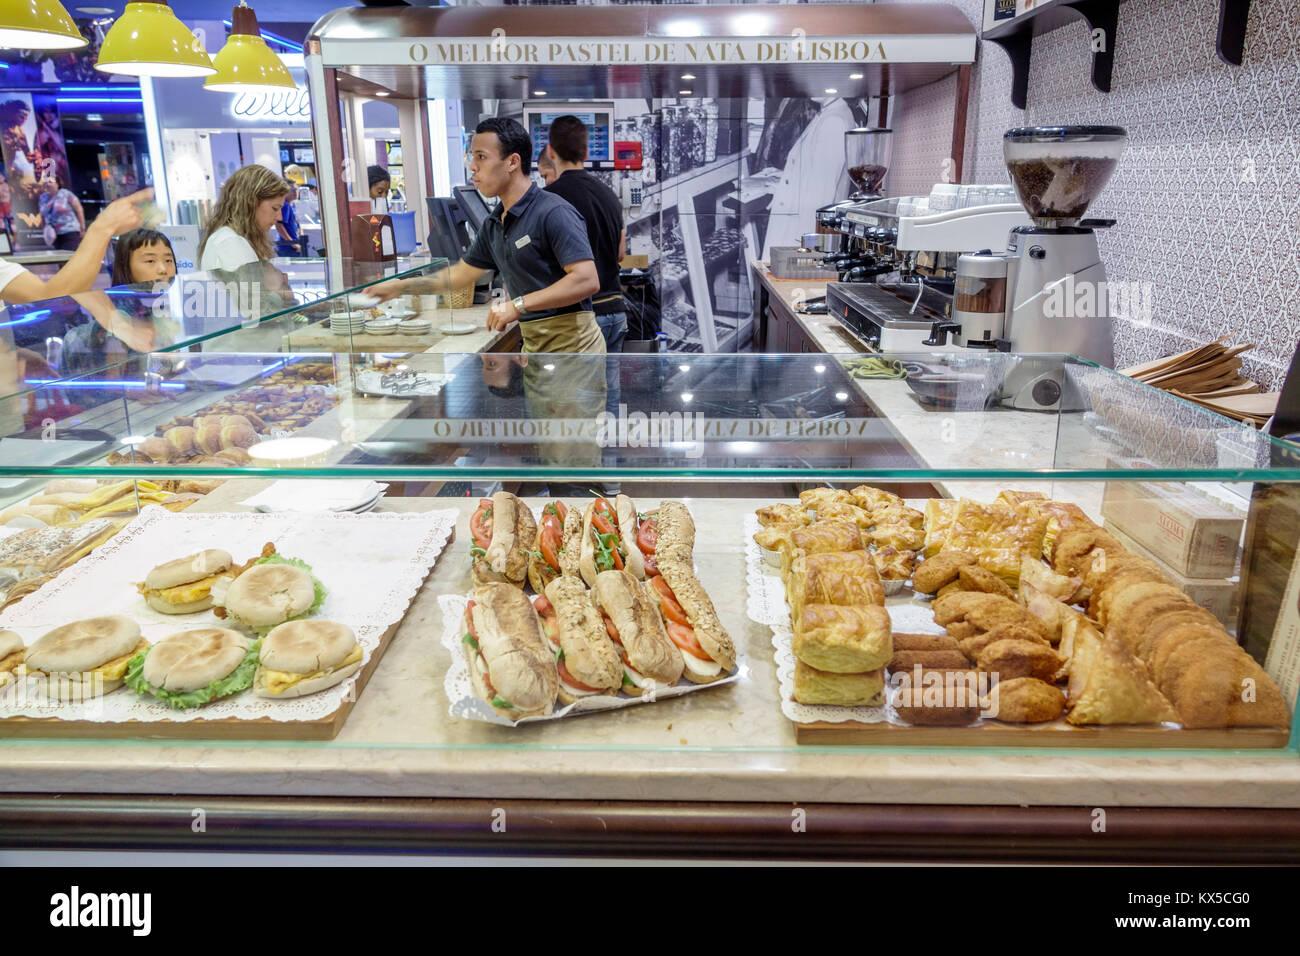 Lisbon Portugal Sao Sebastiao El Corte Ingles Megastore Department Store Cafeteria Food Court Vendor Bakery Restaurant Man Girl Woman Sandwich Portuguese